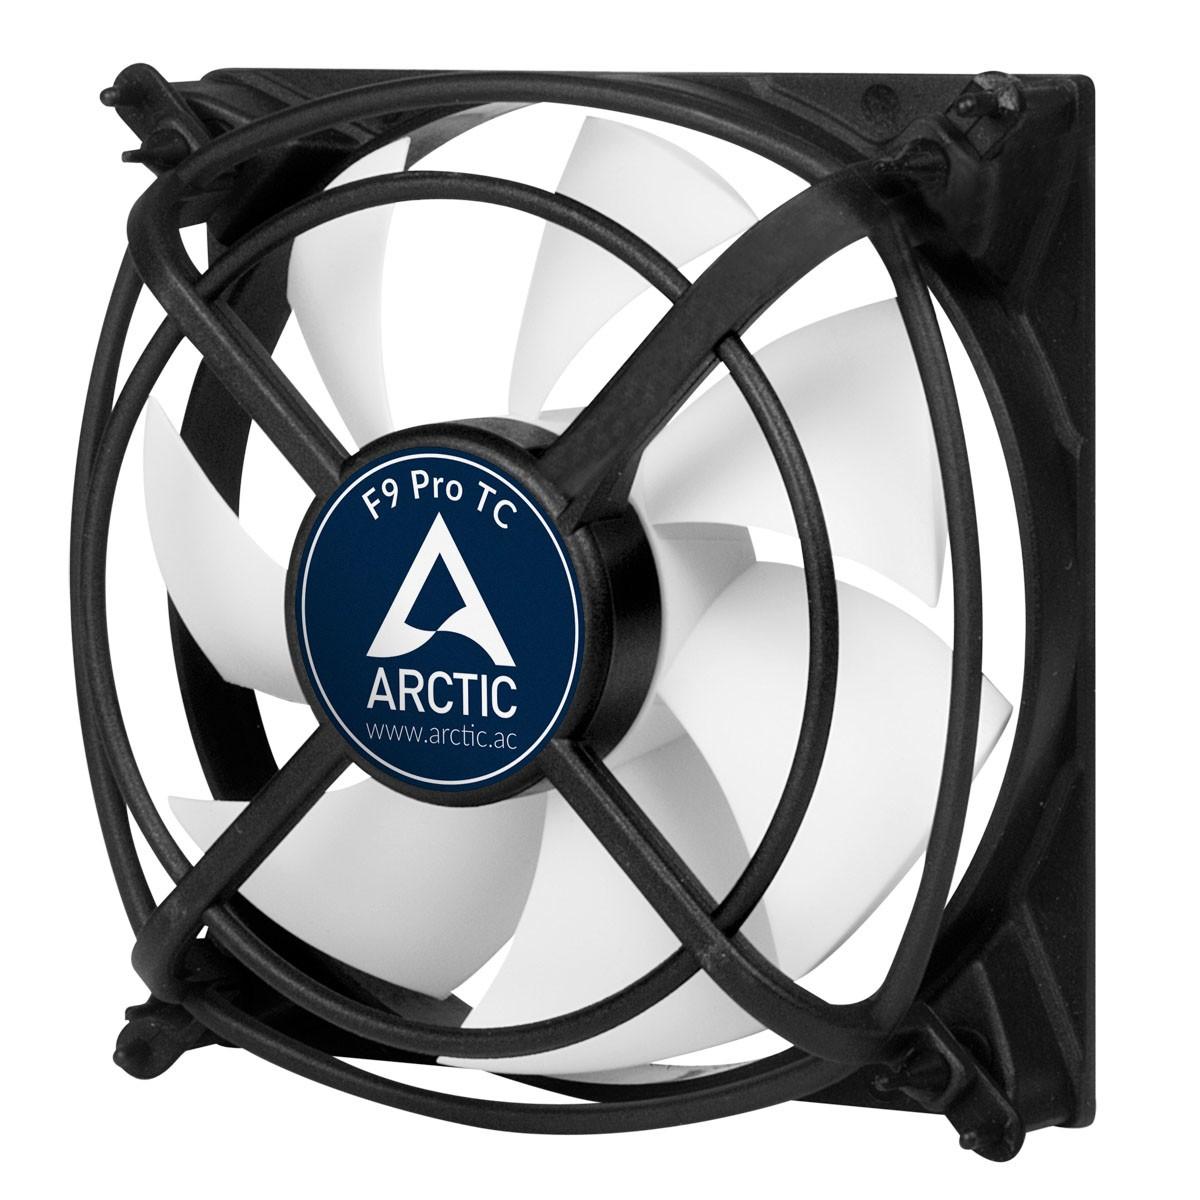 ARCTIC F9 Pro TC Computer behuizing Ventilator 9,2 cm Zwart, Wit